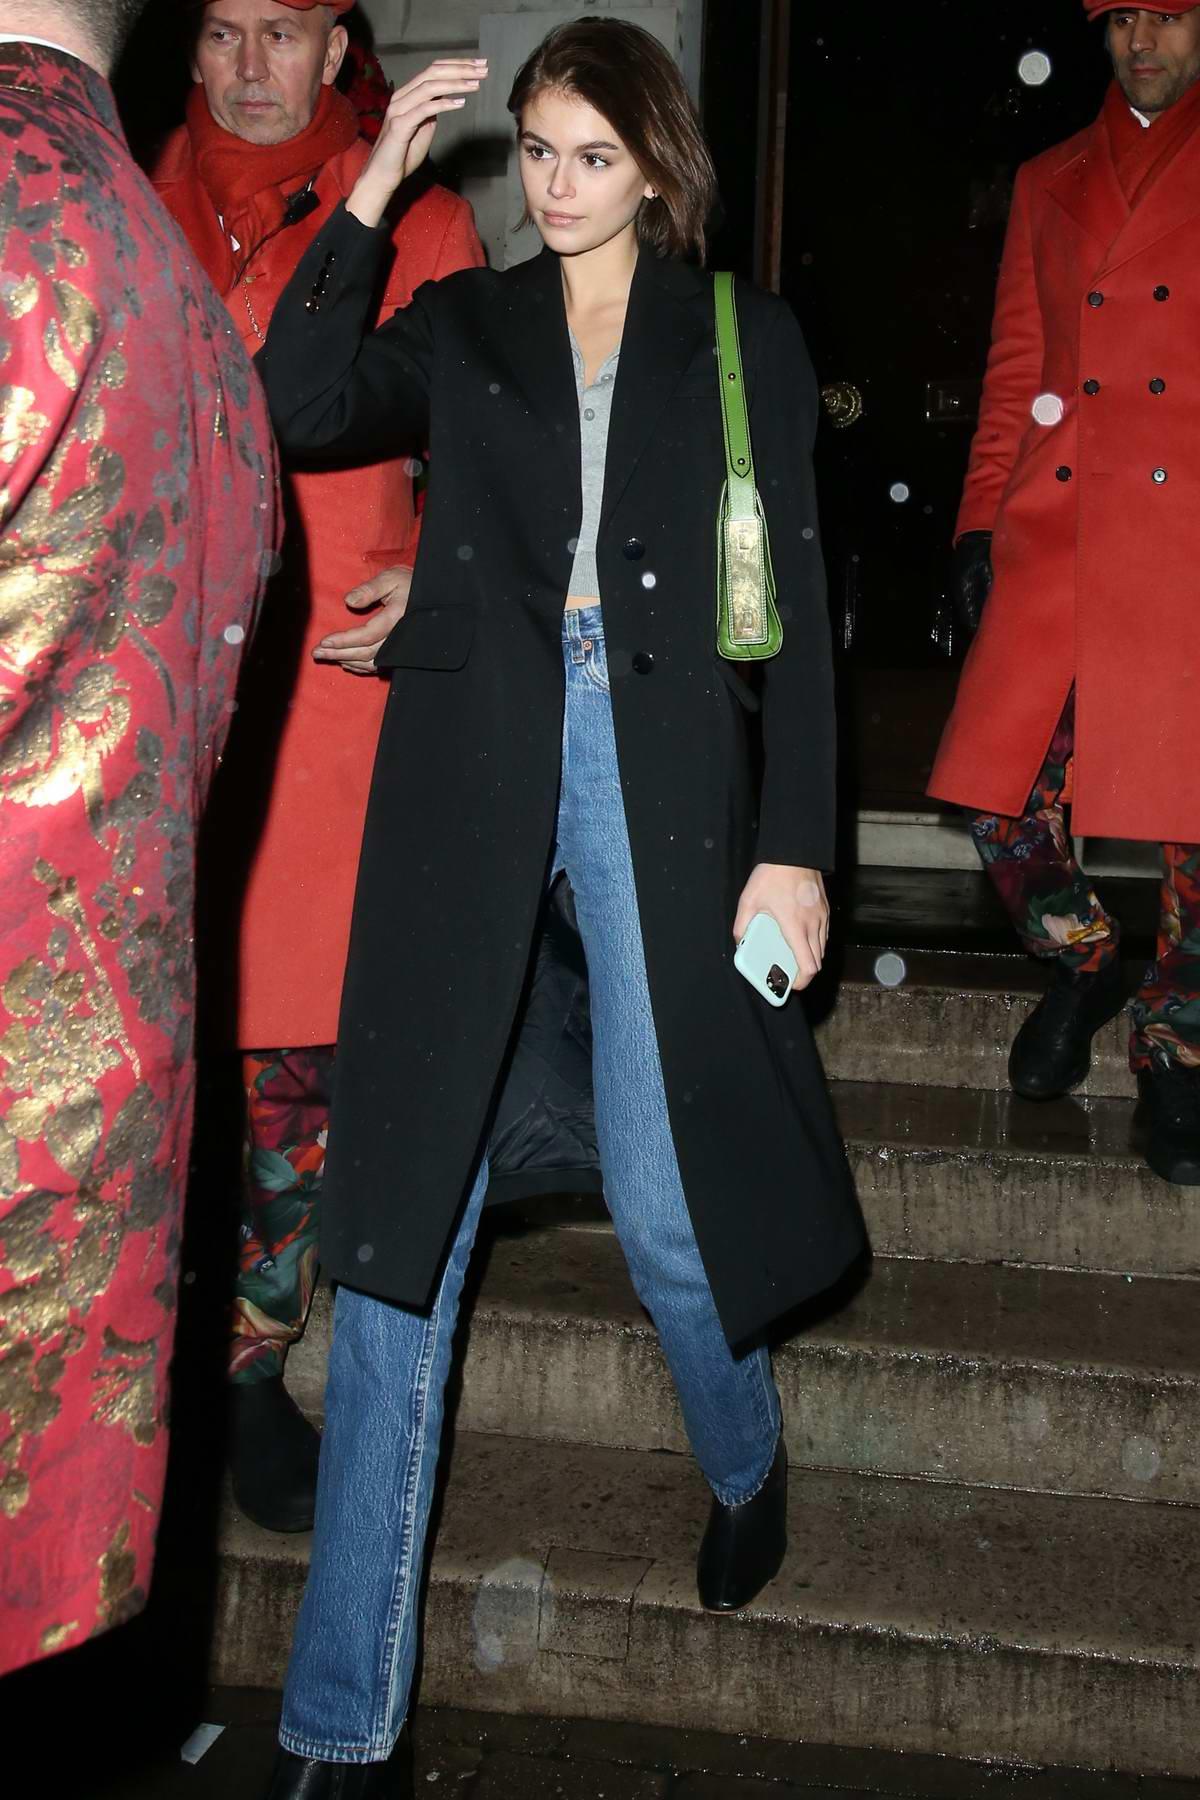 Kaia Gerber seen leaving Annabel's in London, UK